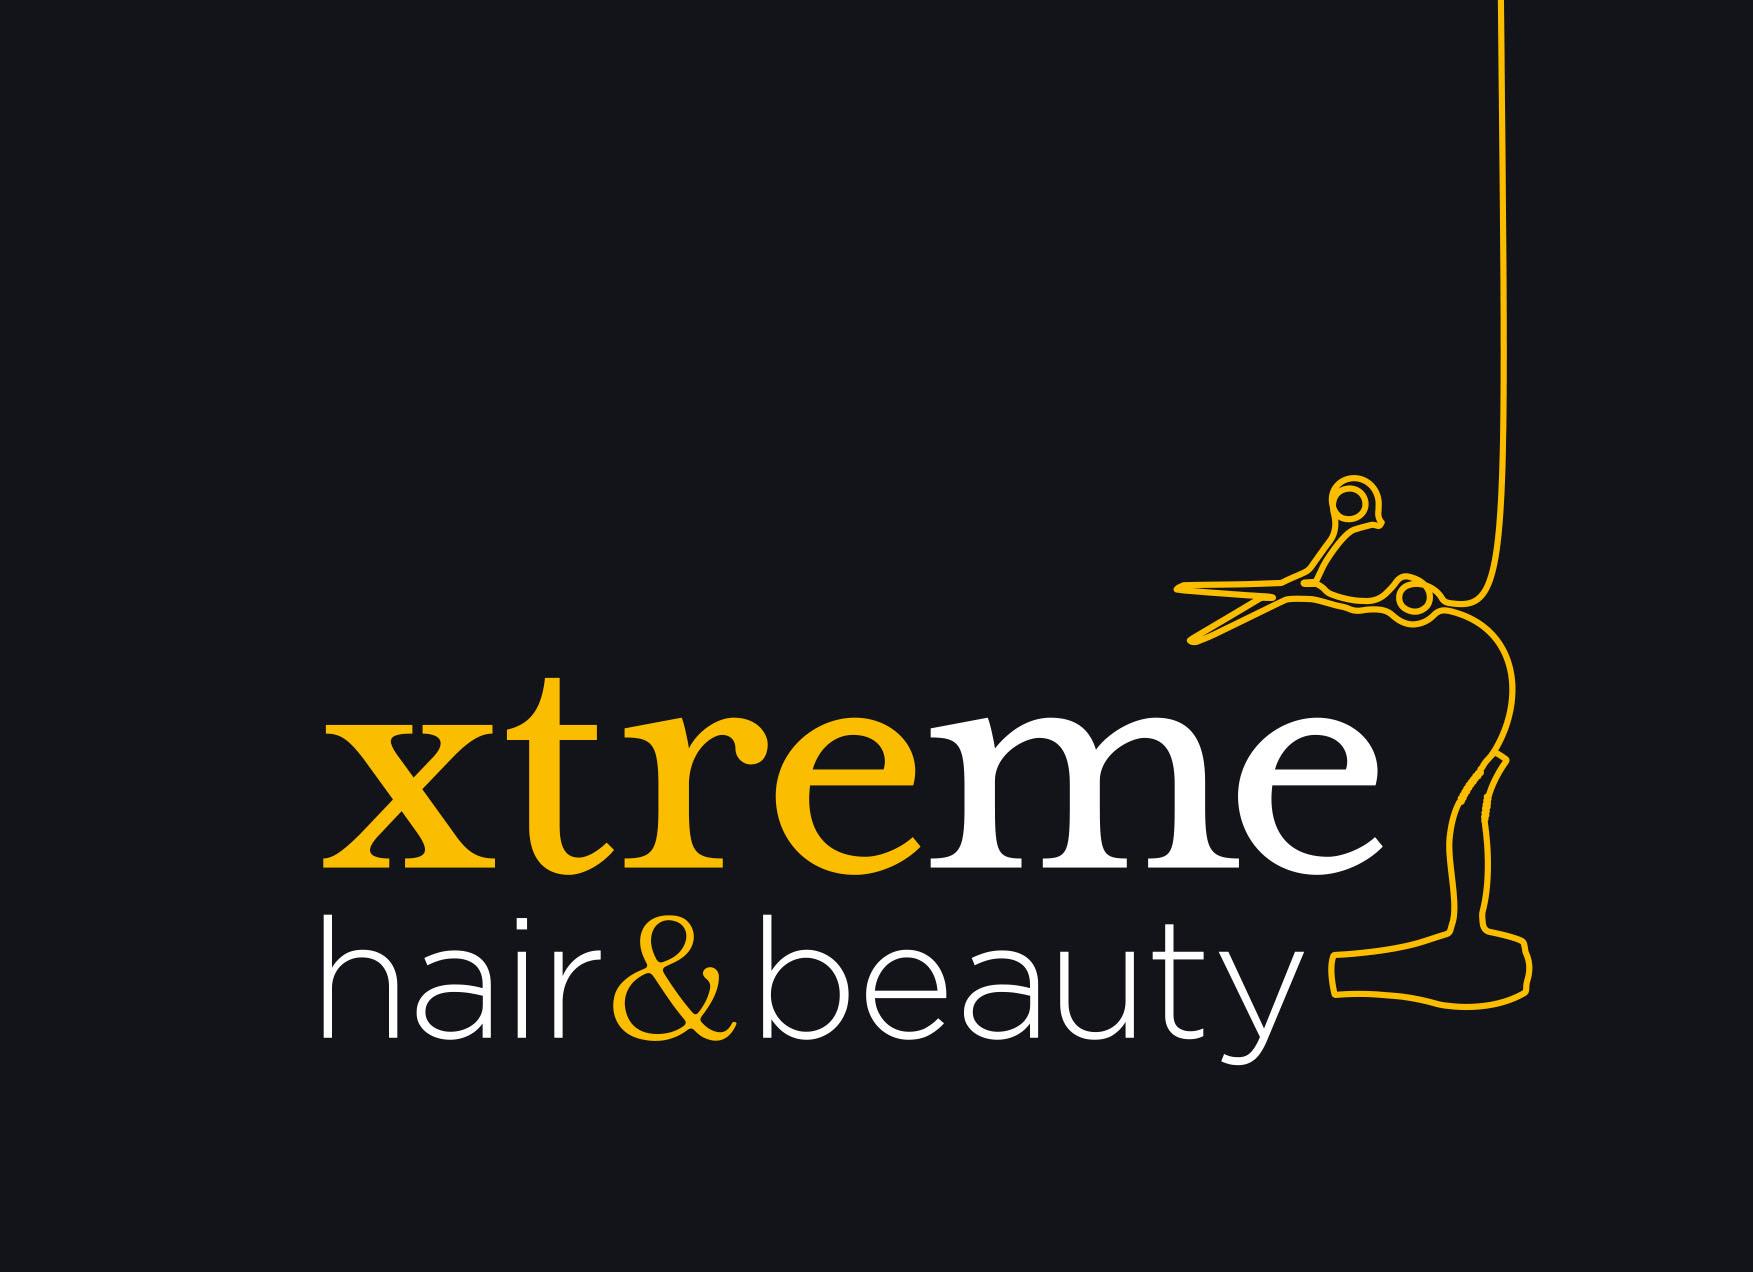 beauty hair xtreme salon